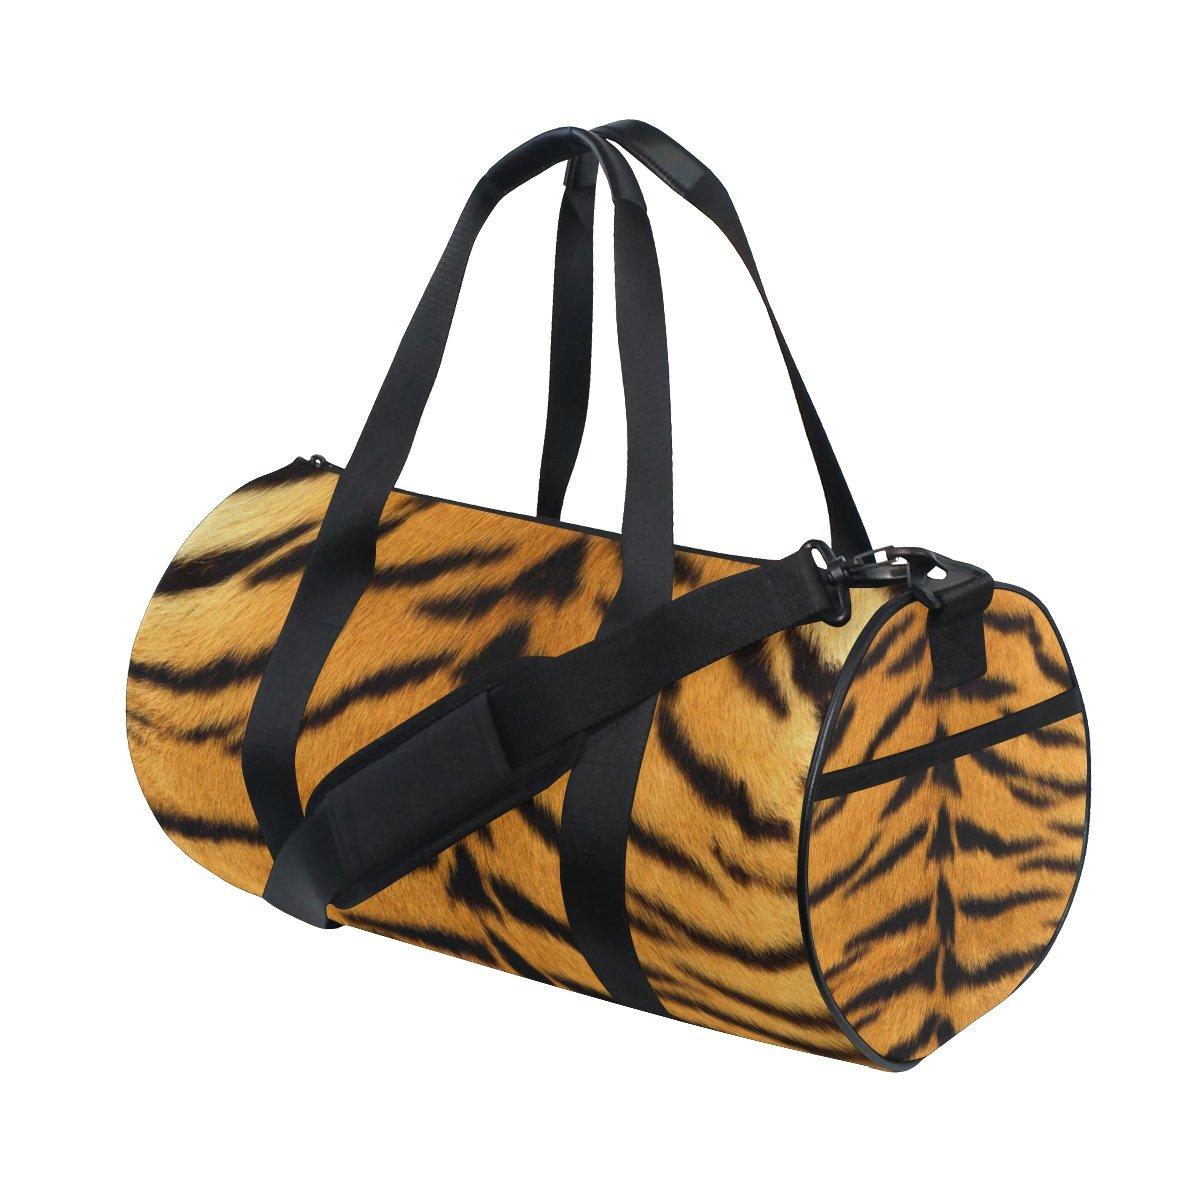 JIUMEI Skin Tiger Stripes Fur Striped Lightweight Canvas Sports Bag Travel Duffel Yoga Gym Bags Shoulder Bag for Women Men Girls Boys